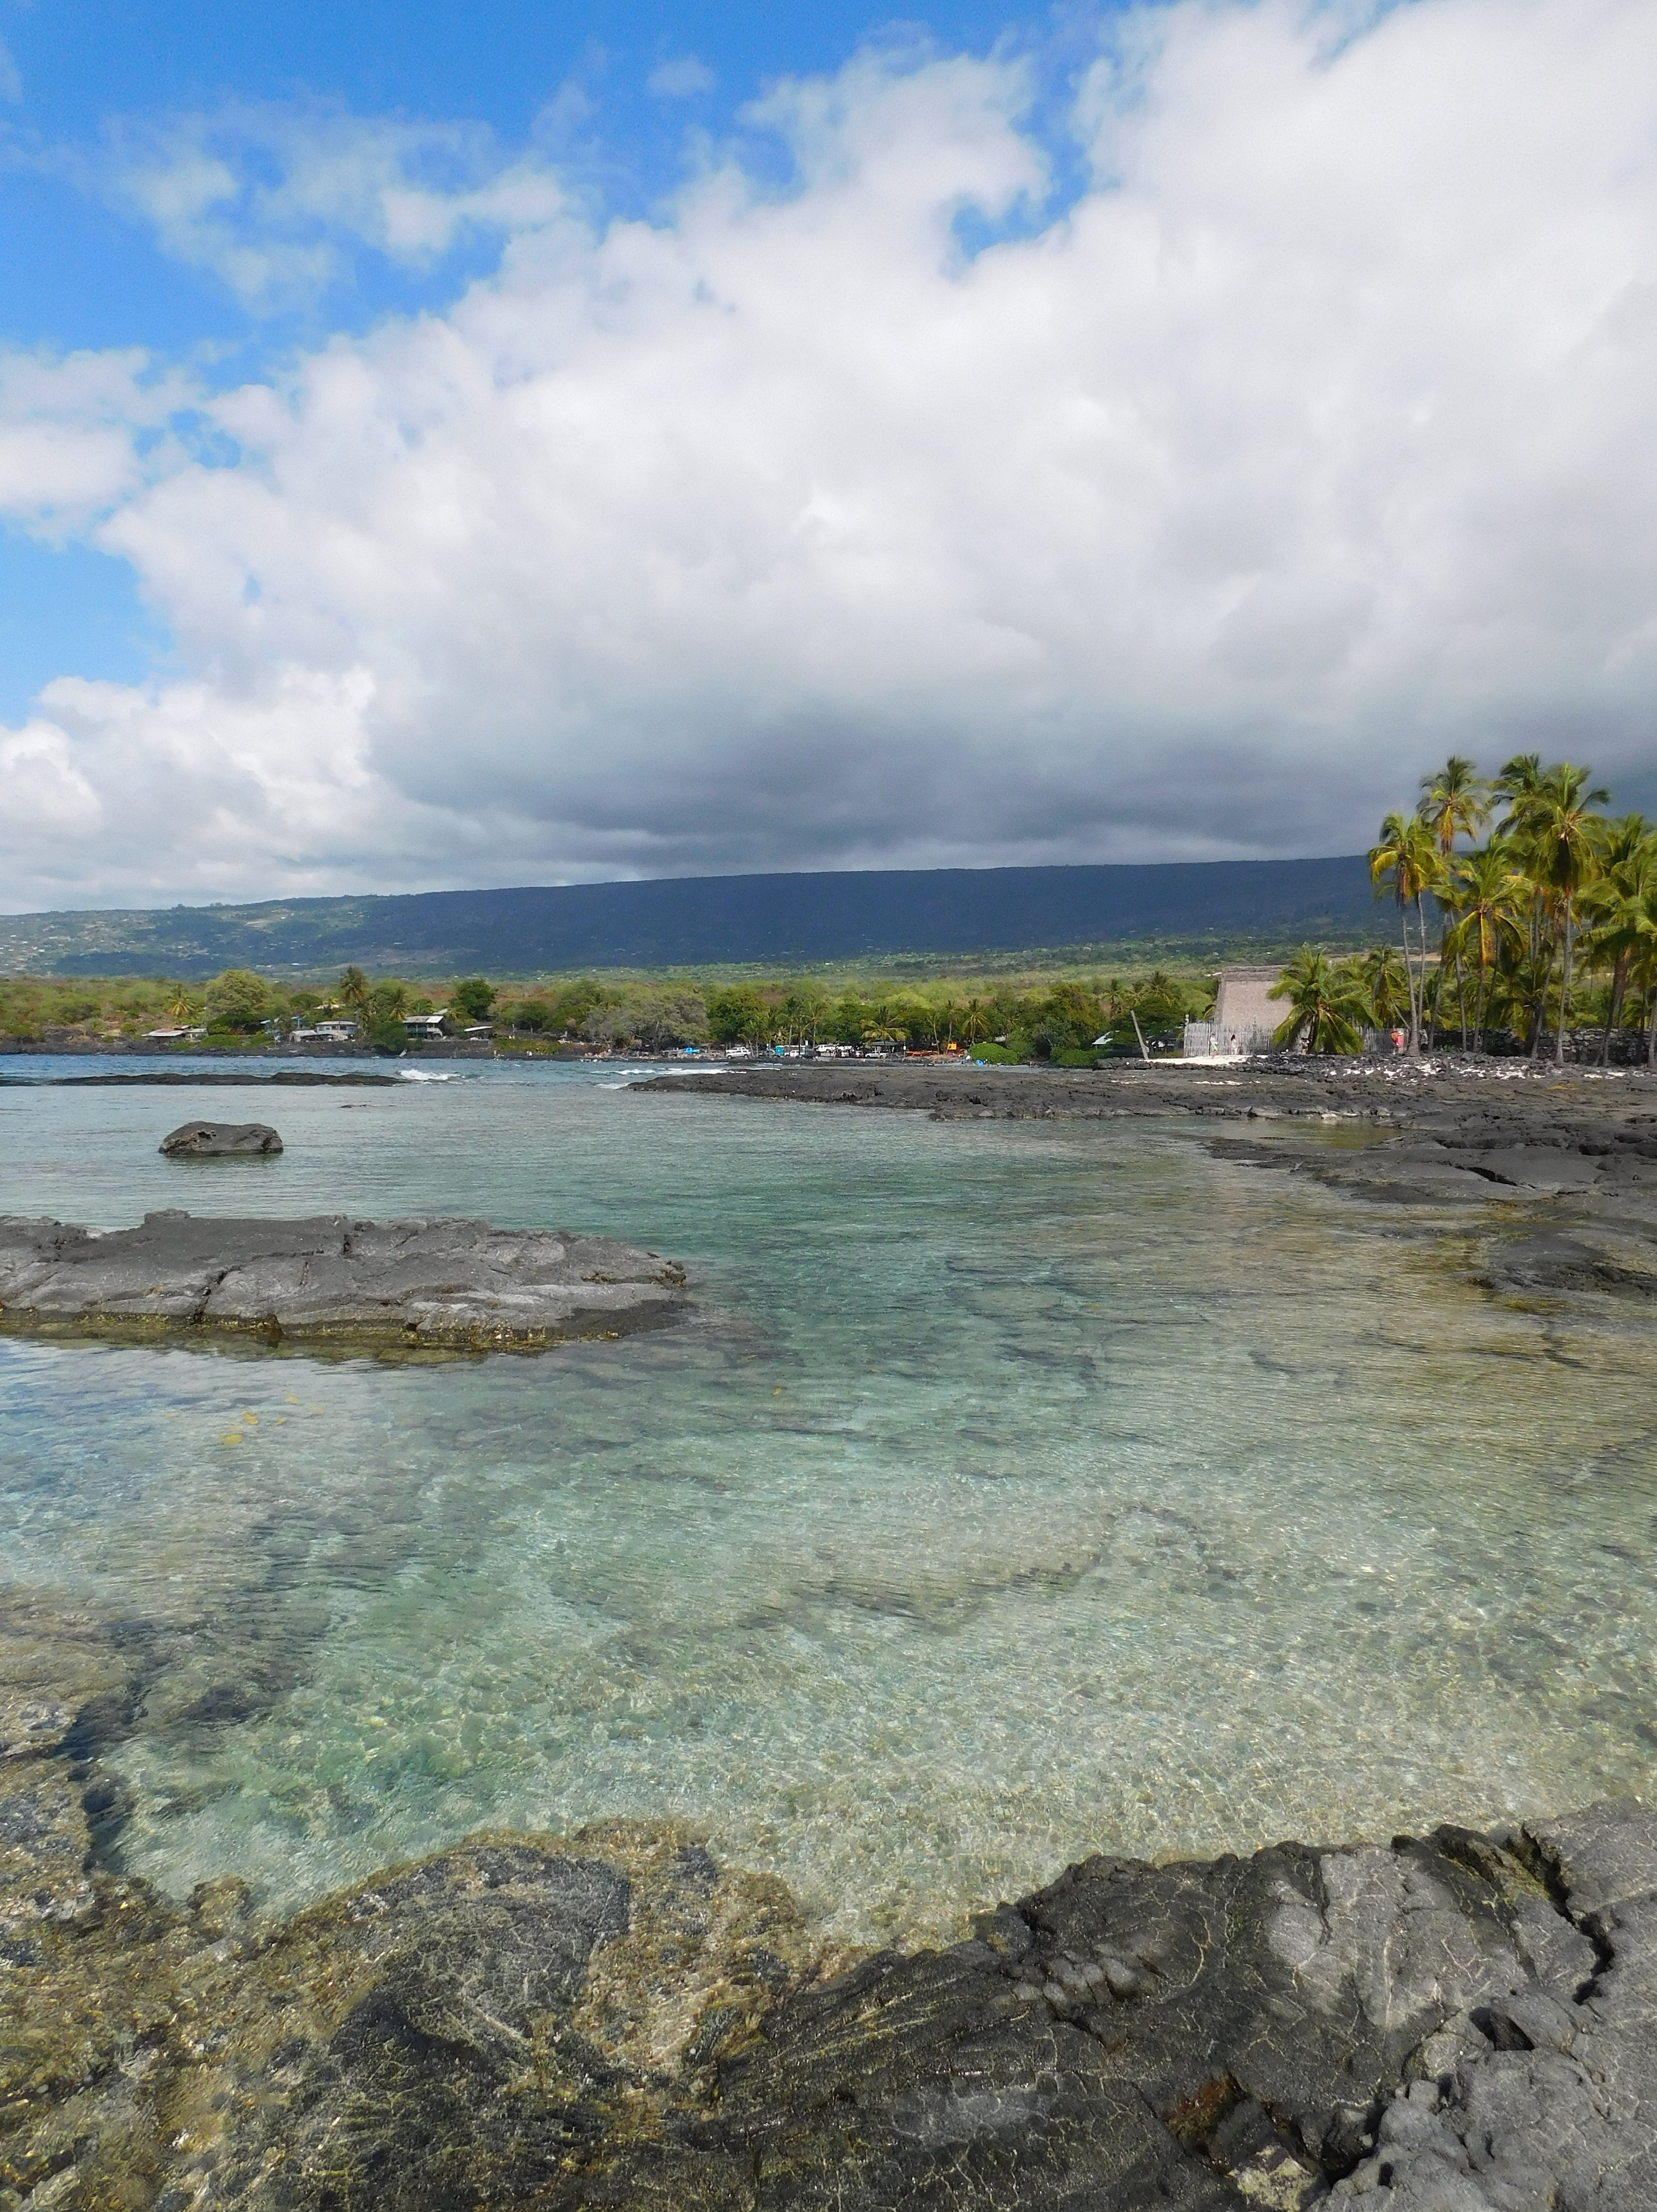 Rock pools at Puʻuhonua o Hōnaunau National Historical Park on the Big Island of Hawaii